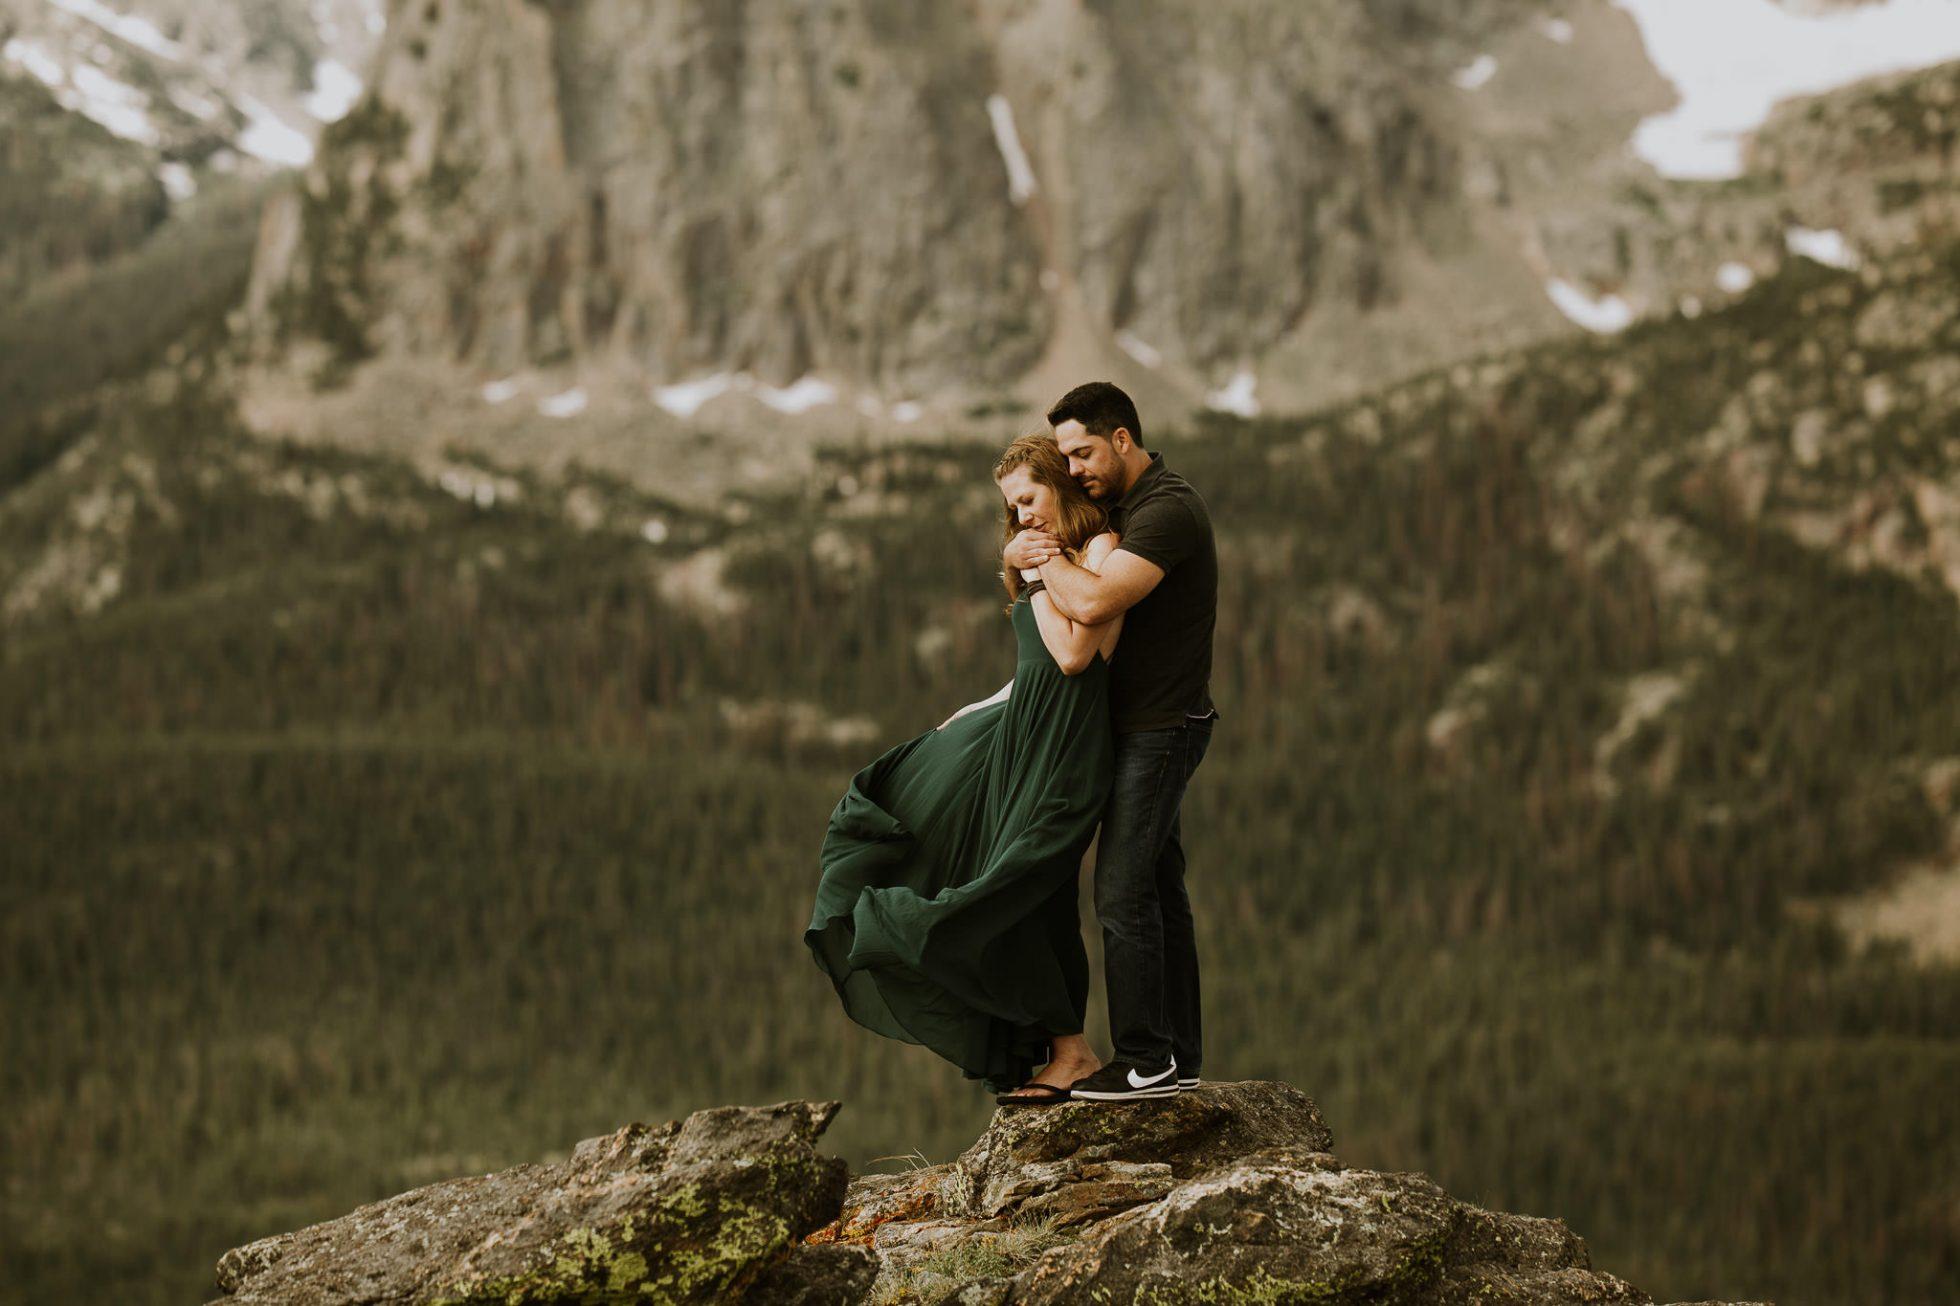 Intimate Weddings Adventurous Elopements, Justyna E Butler